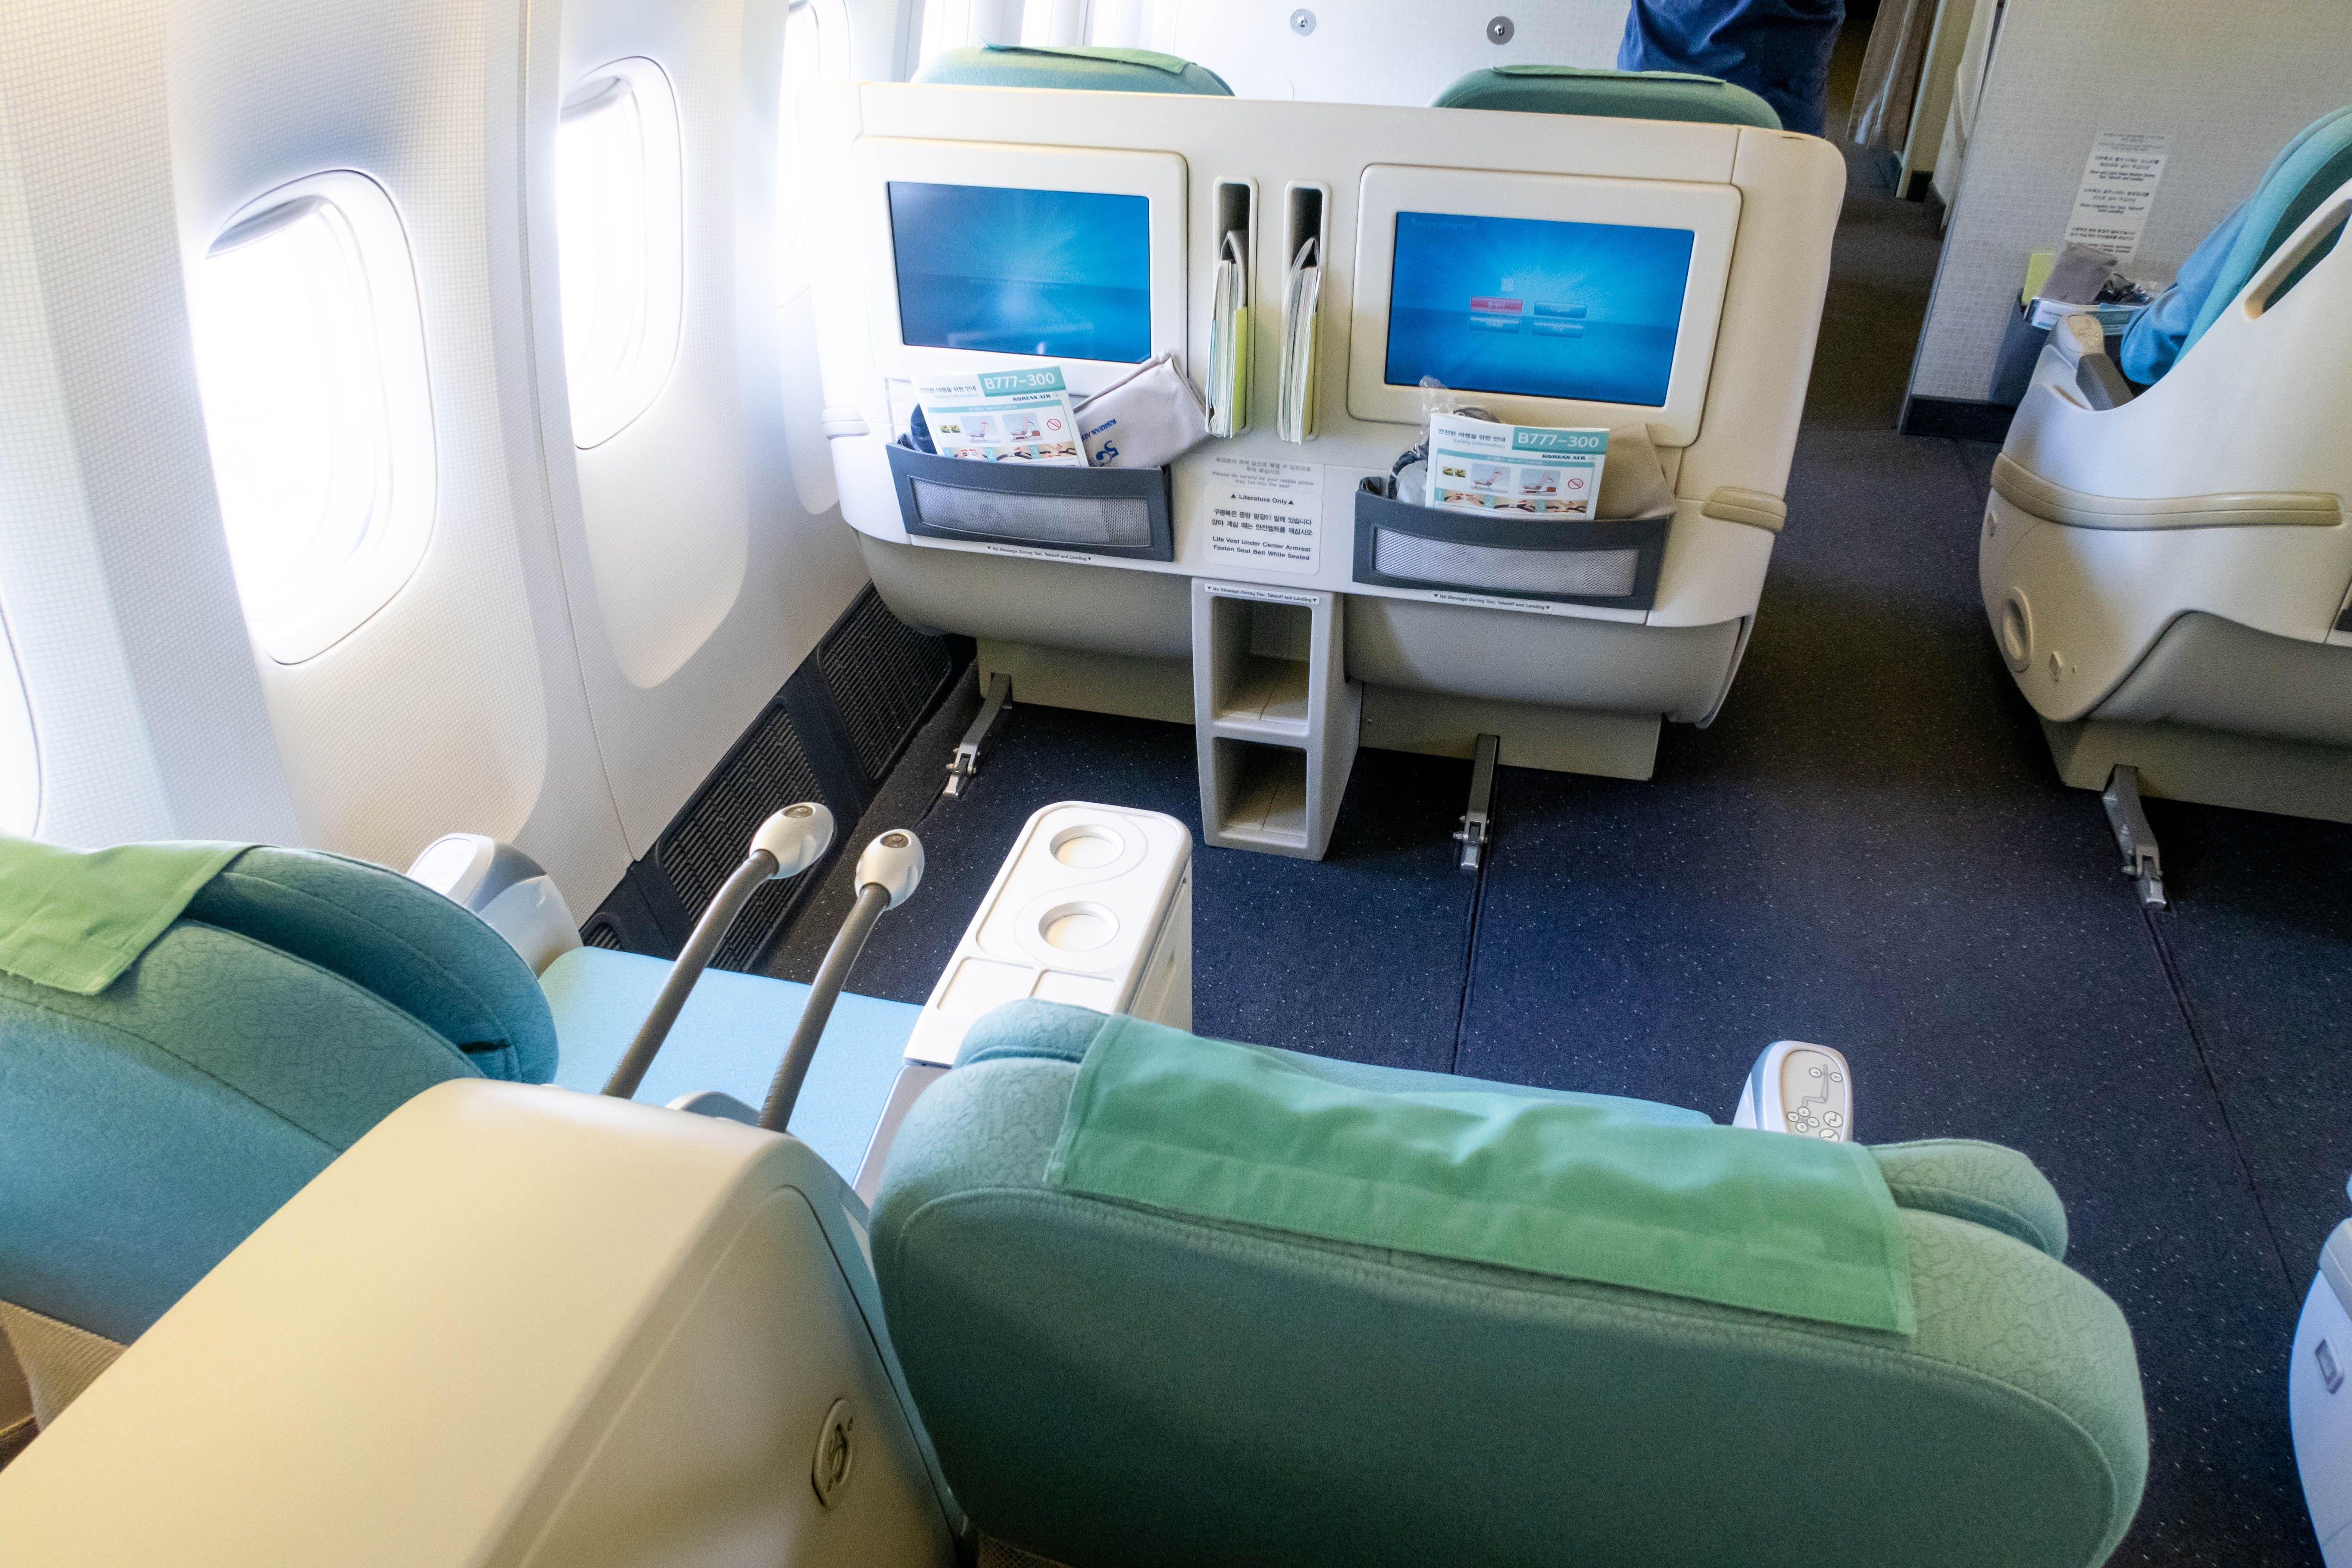 Korean Air 777300 Business Class (Review & Photos